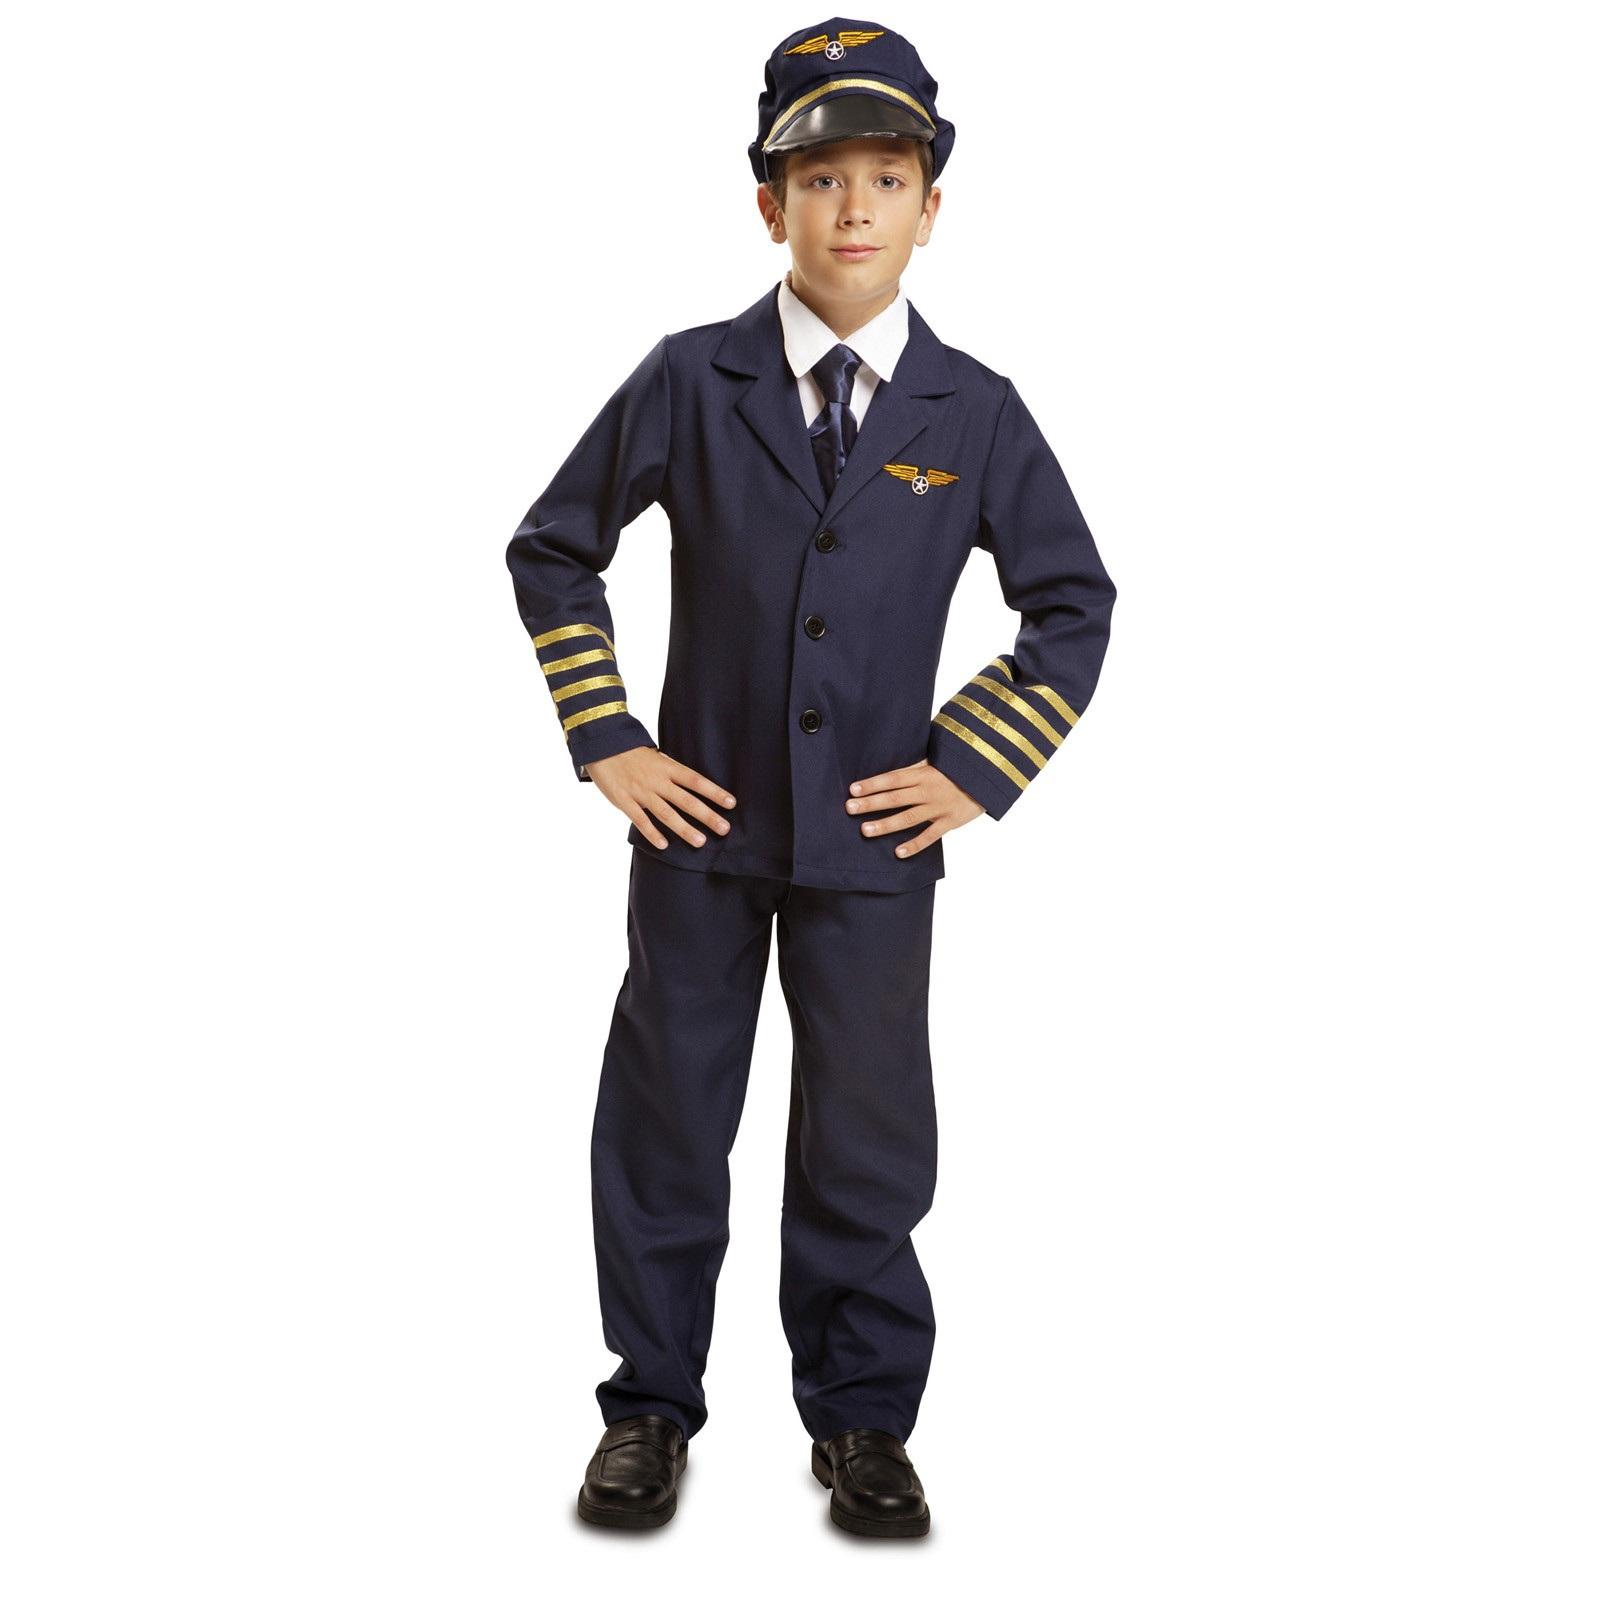 disfraz de piloto vuelo niño 200905mom - DISFRAZ DE PILOTO DE VUELO NIÑO